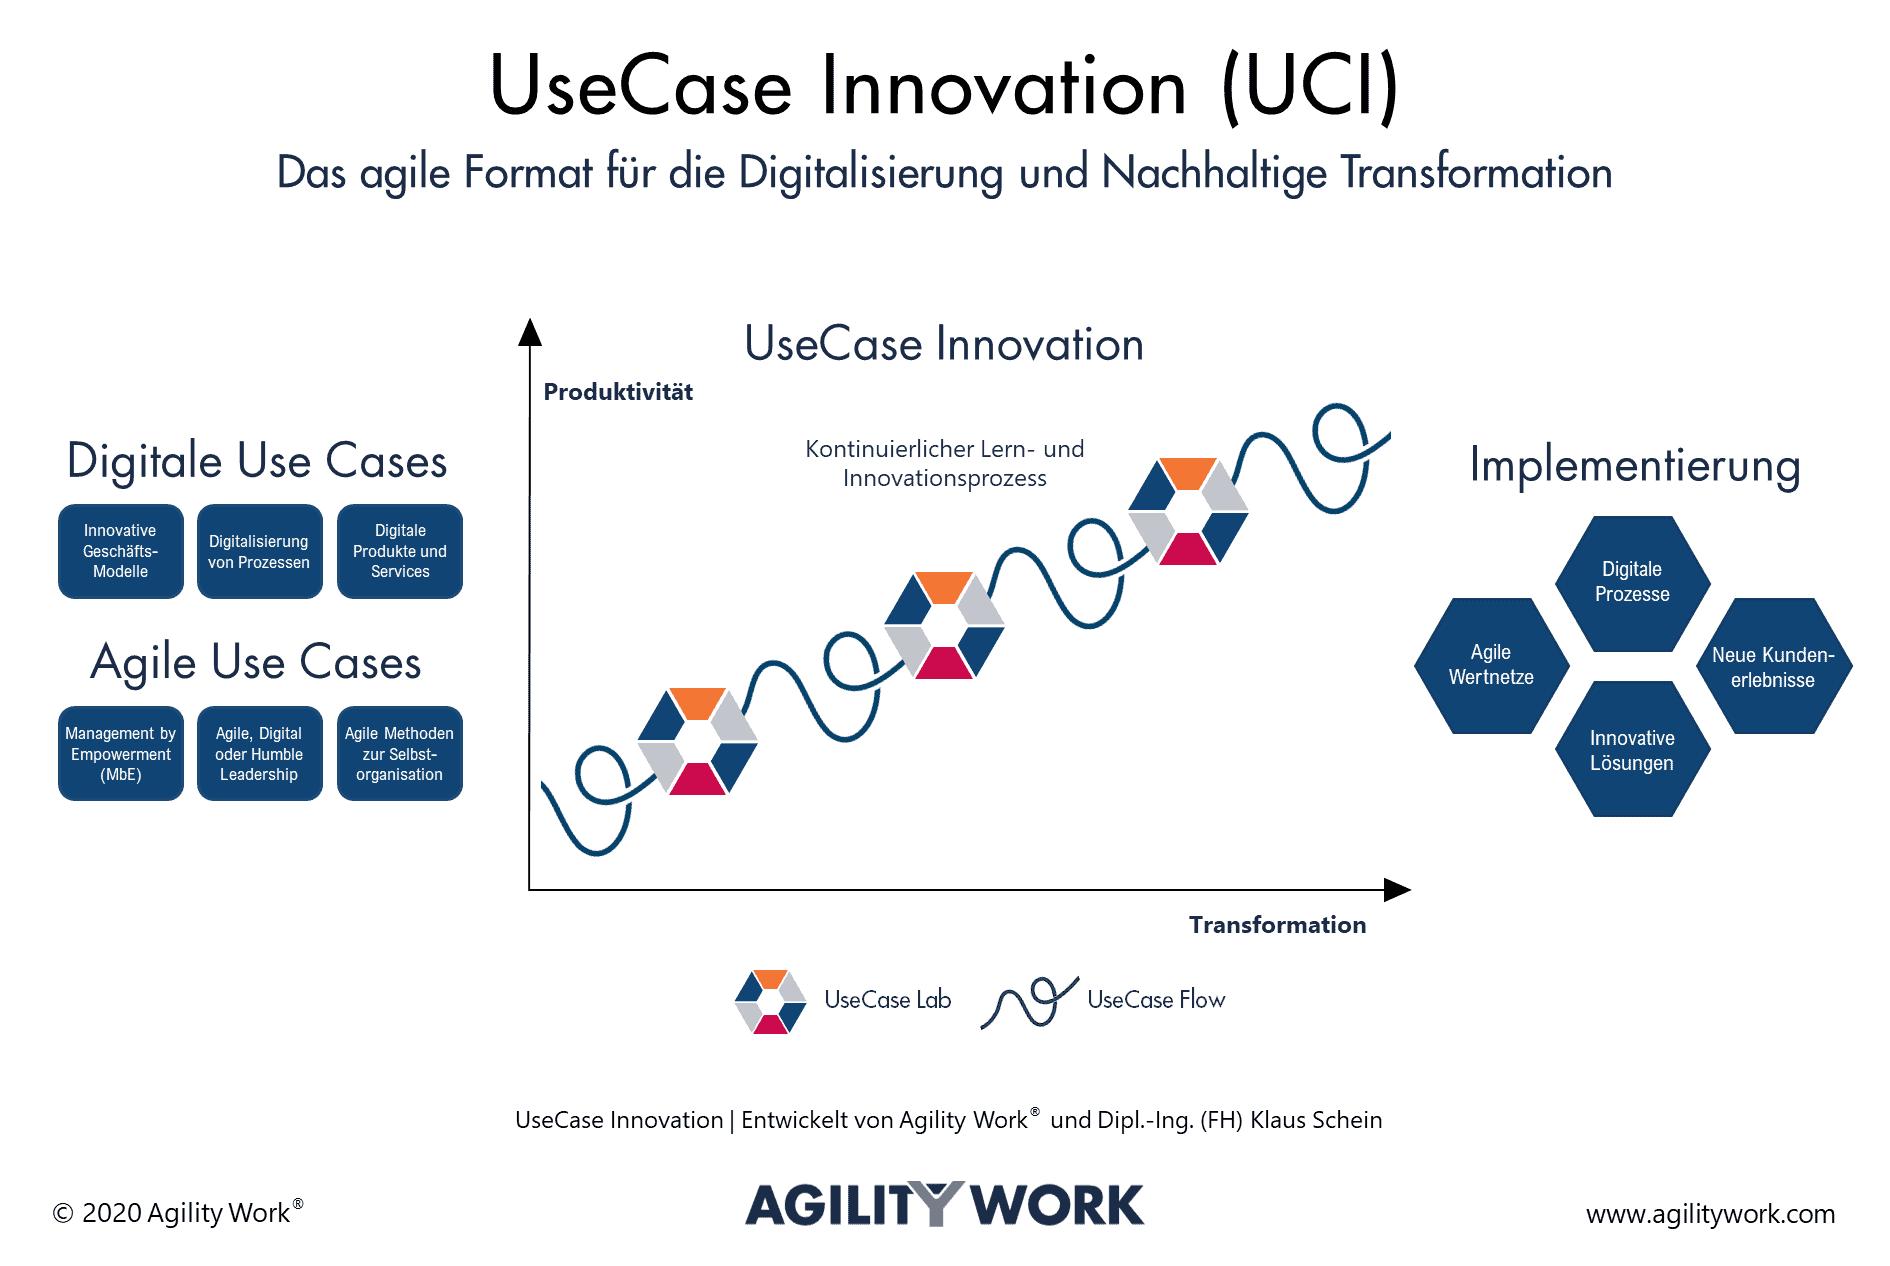 UseCase Innovation